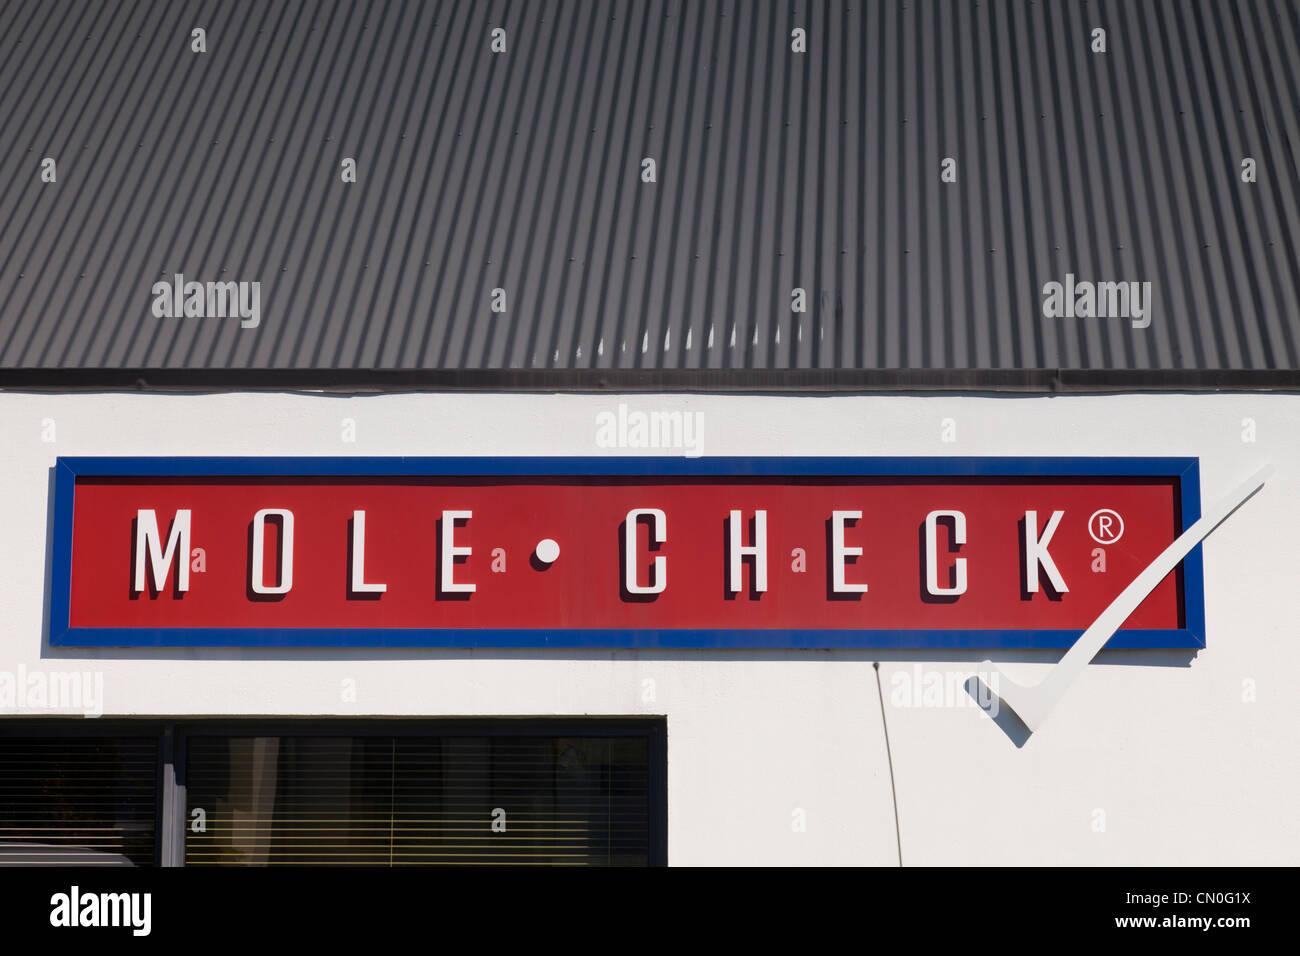 Mole Check Clinic Merivale Christchurch New Zealand - Stock Image